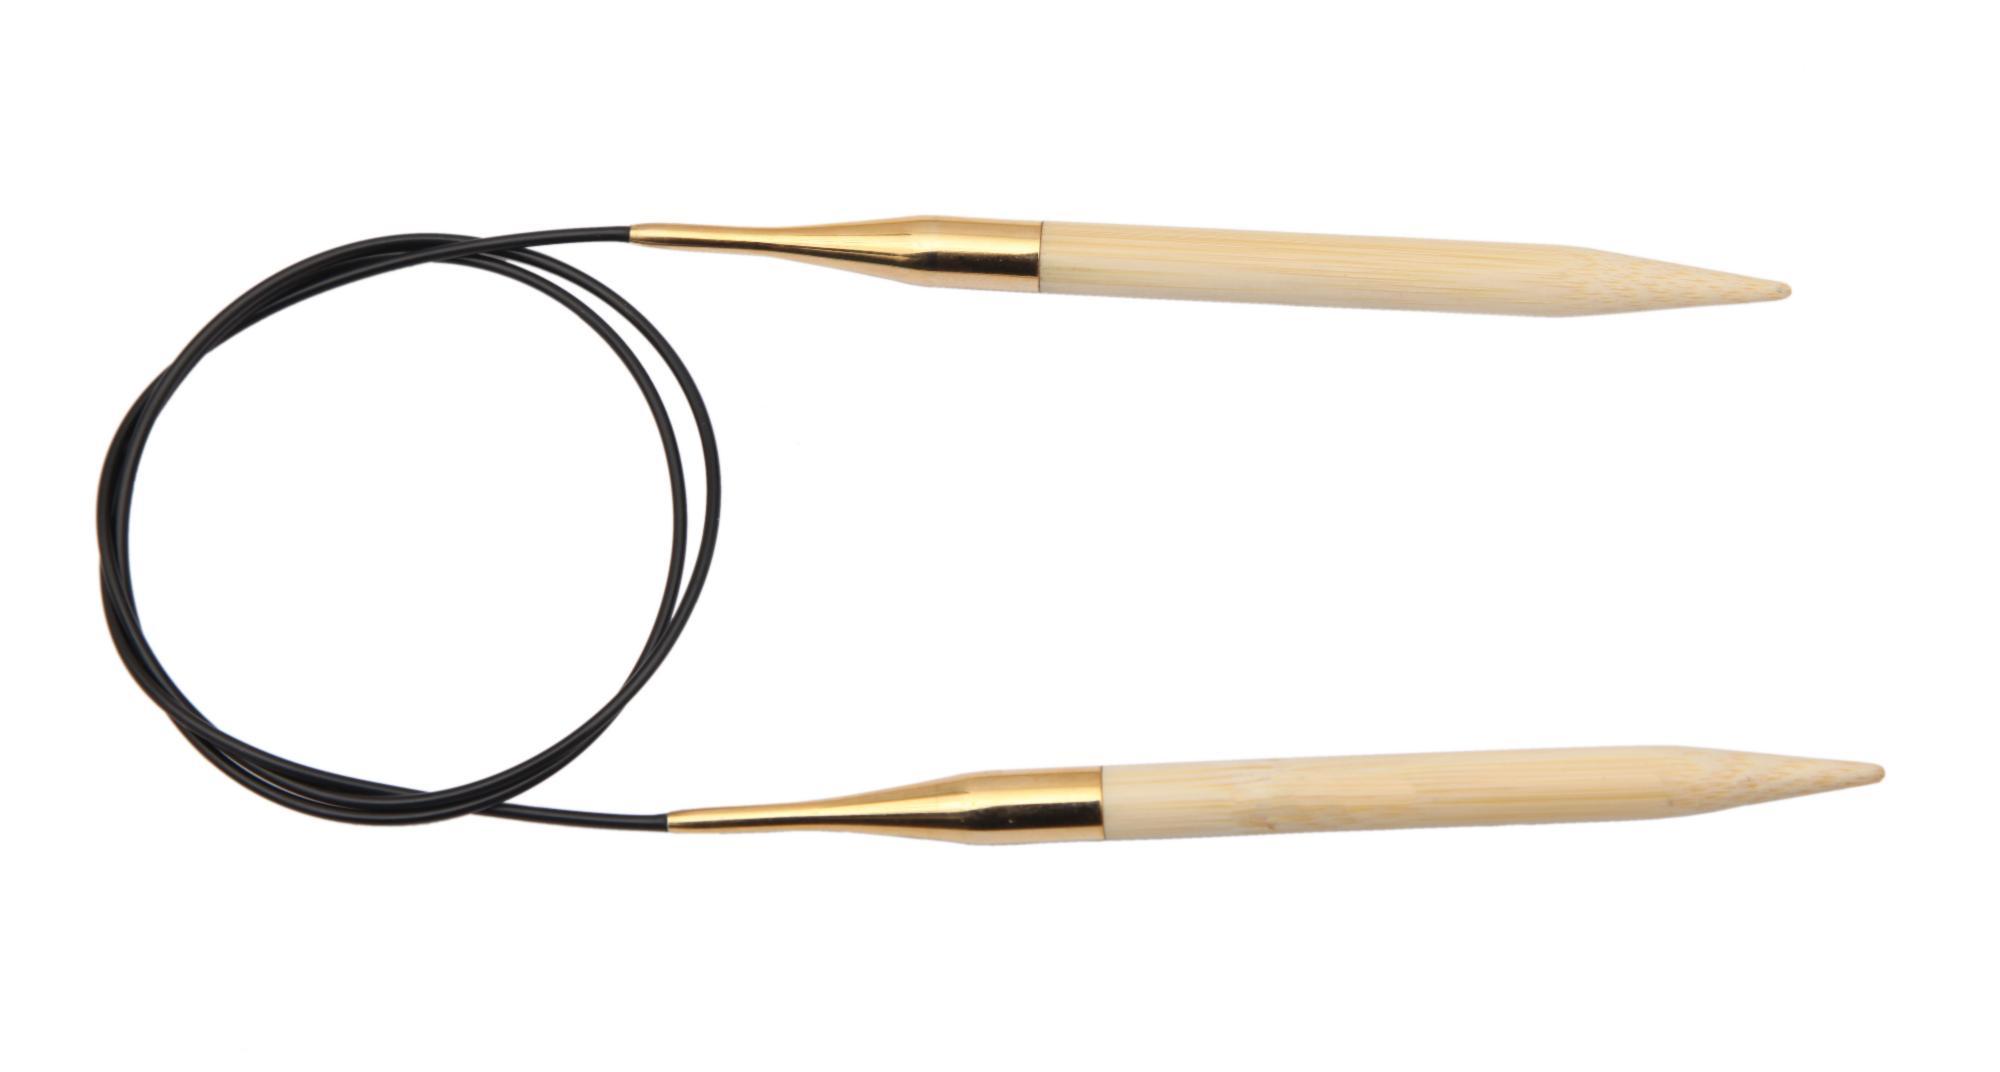 Спицы круговые 60 см Bamboo KnitPro, 22232, 6.50 мм